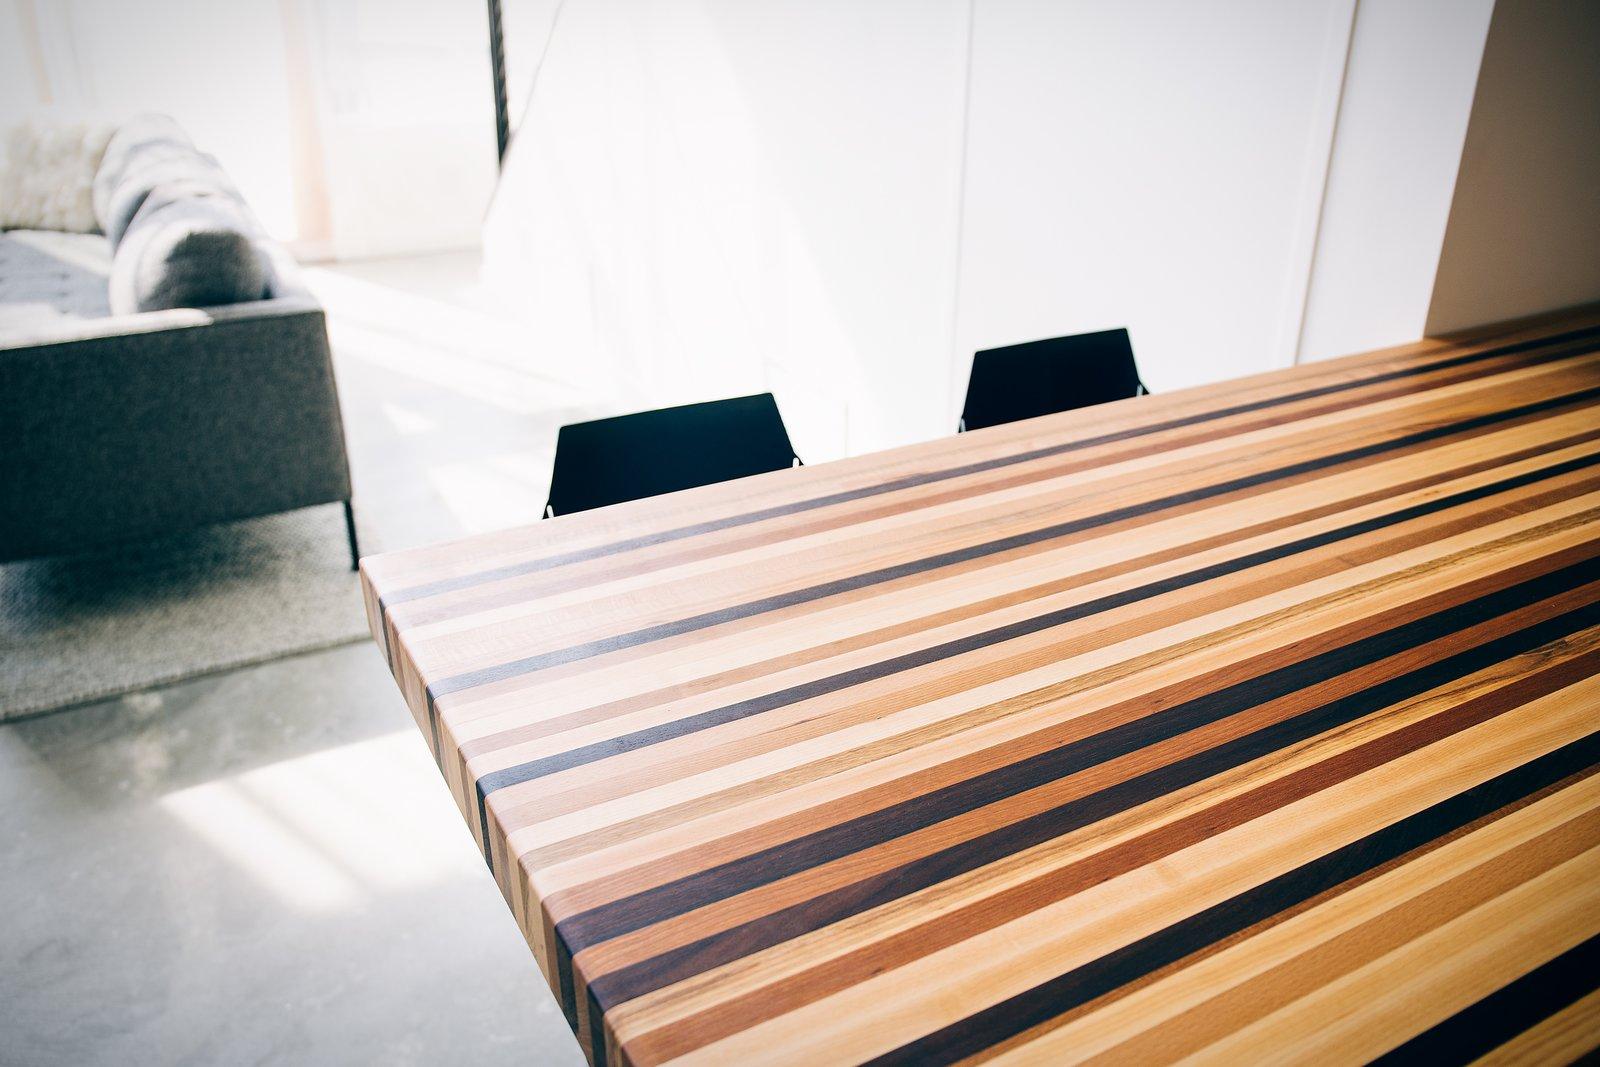 Mission Loft wooden kitchen countertop